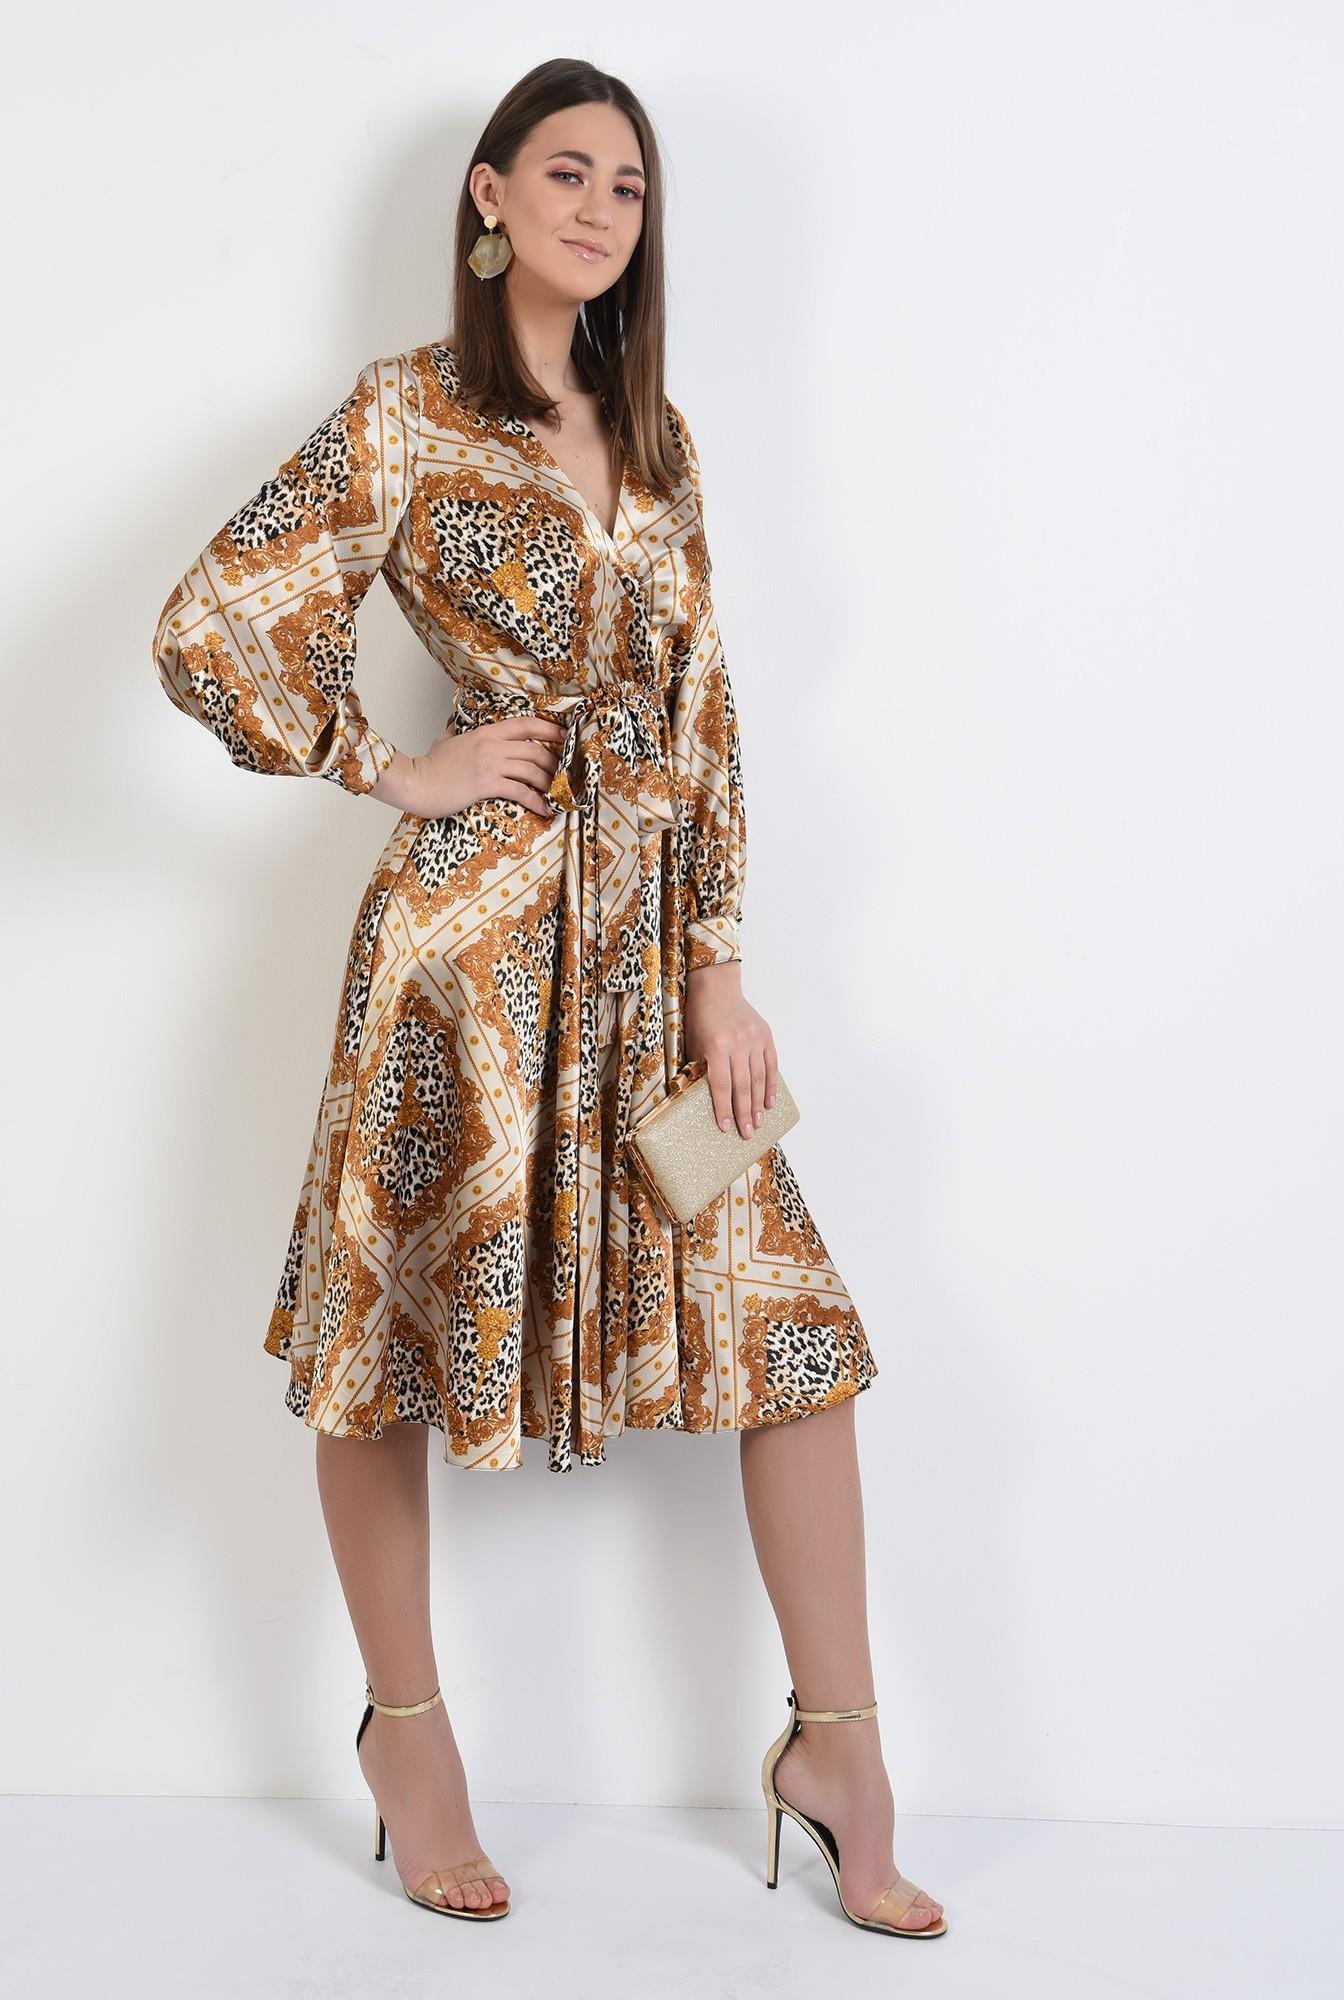 3 -  rochie eleganta, midi, evazata, cu imprimeu, animal print, rochie de primavara